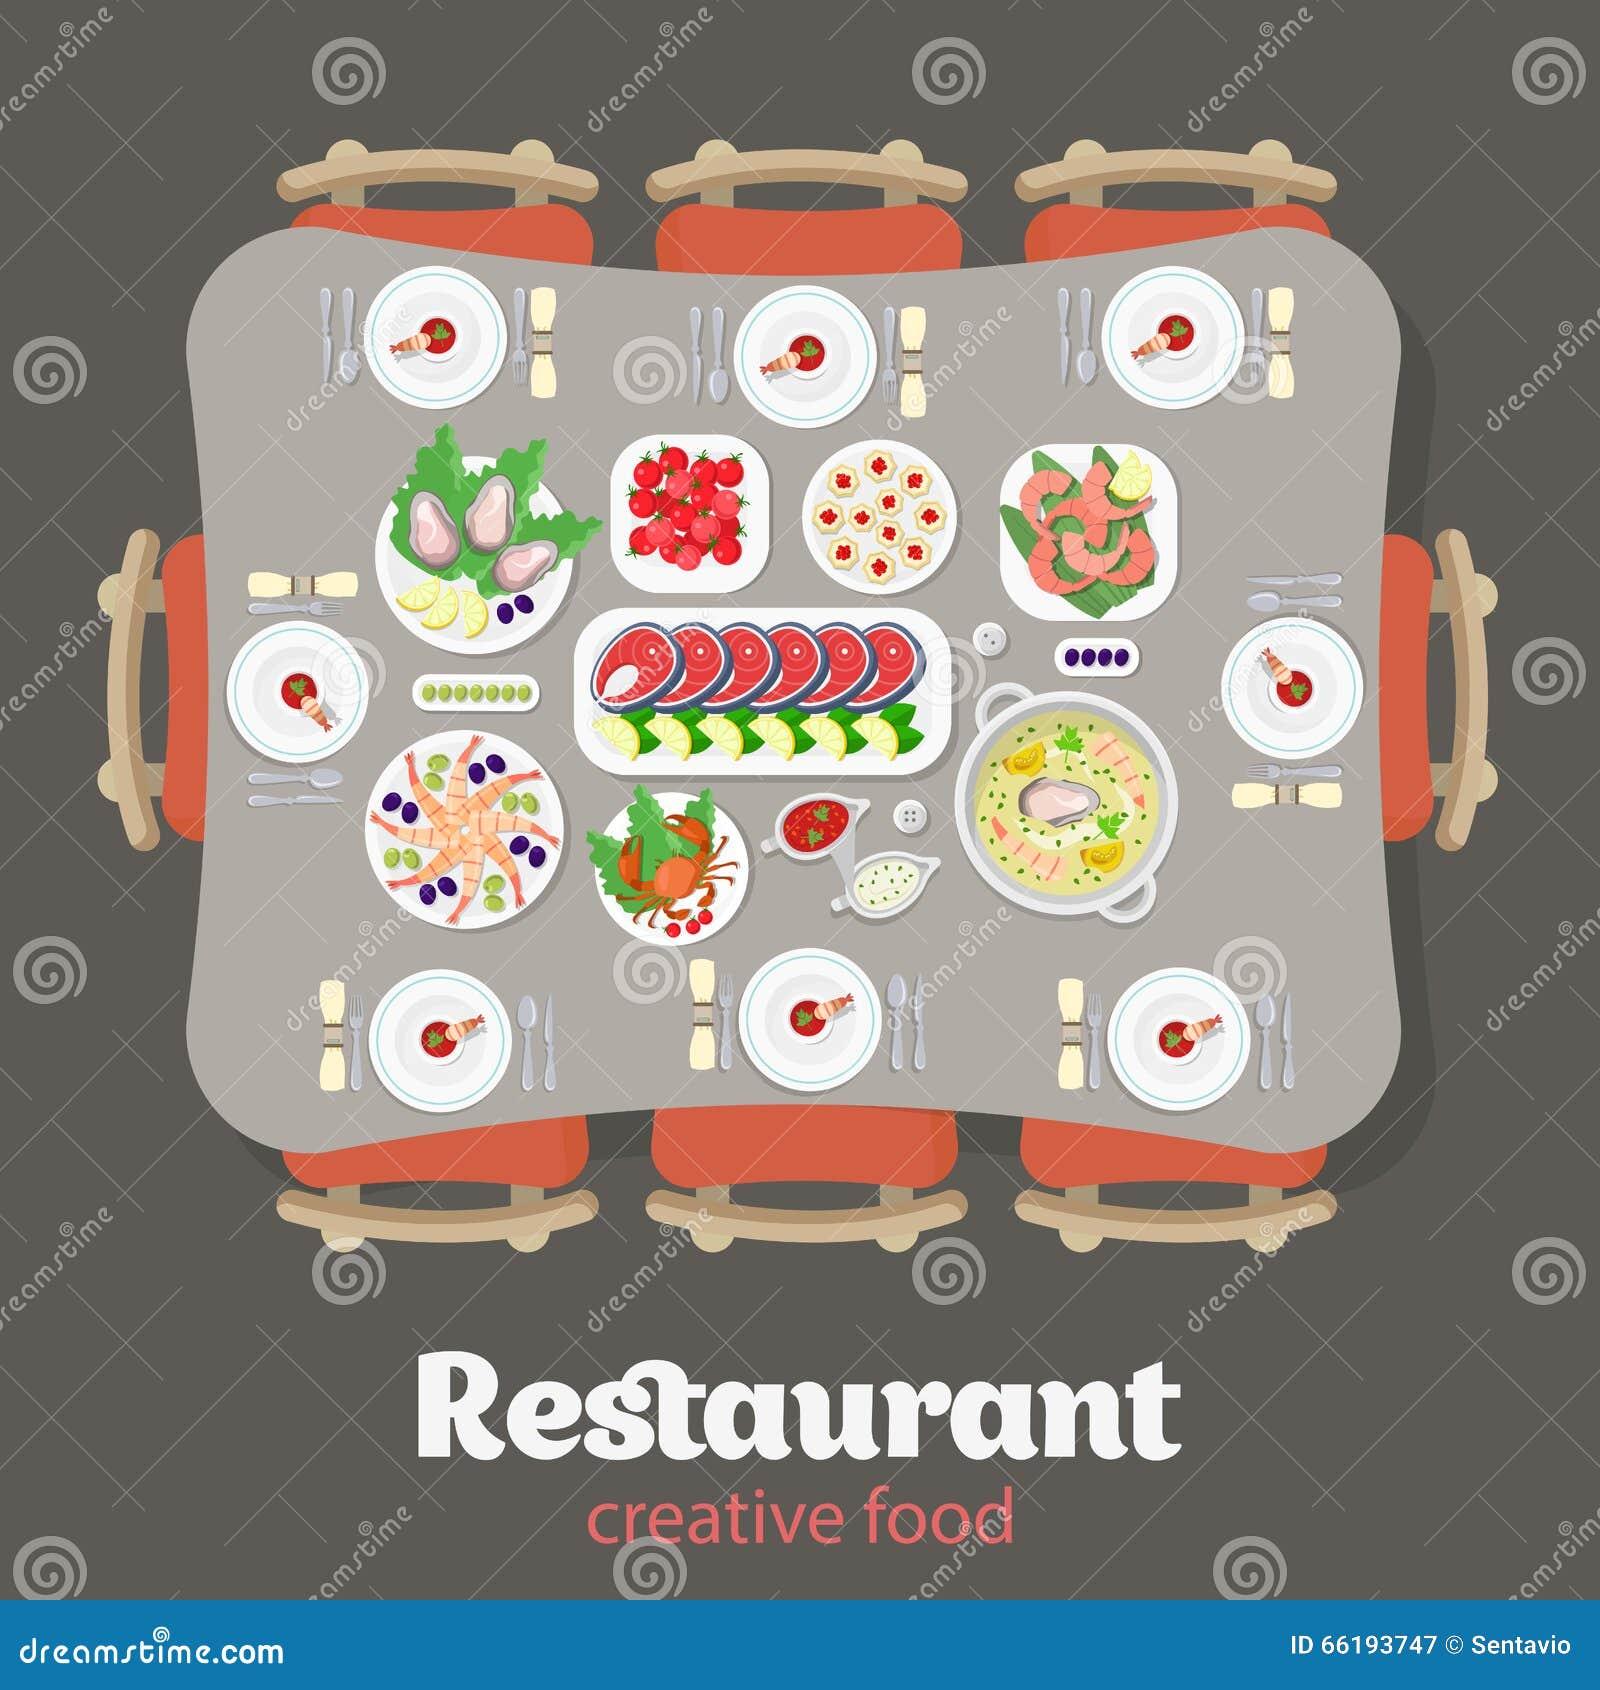 Cartoon restaurant free vector graphic download - Royalty Free Vector